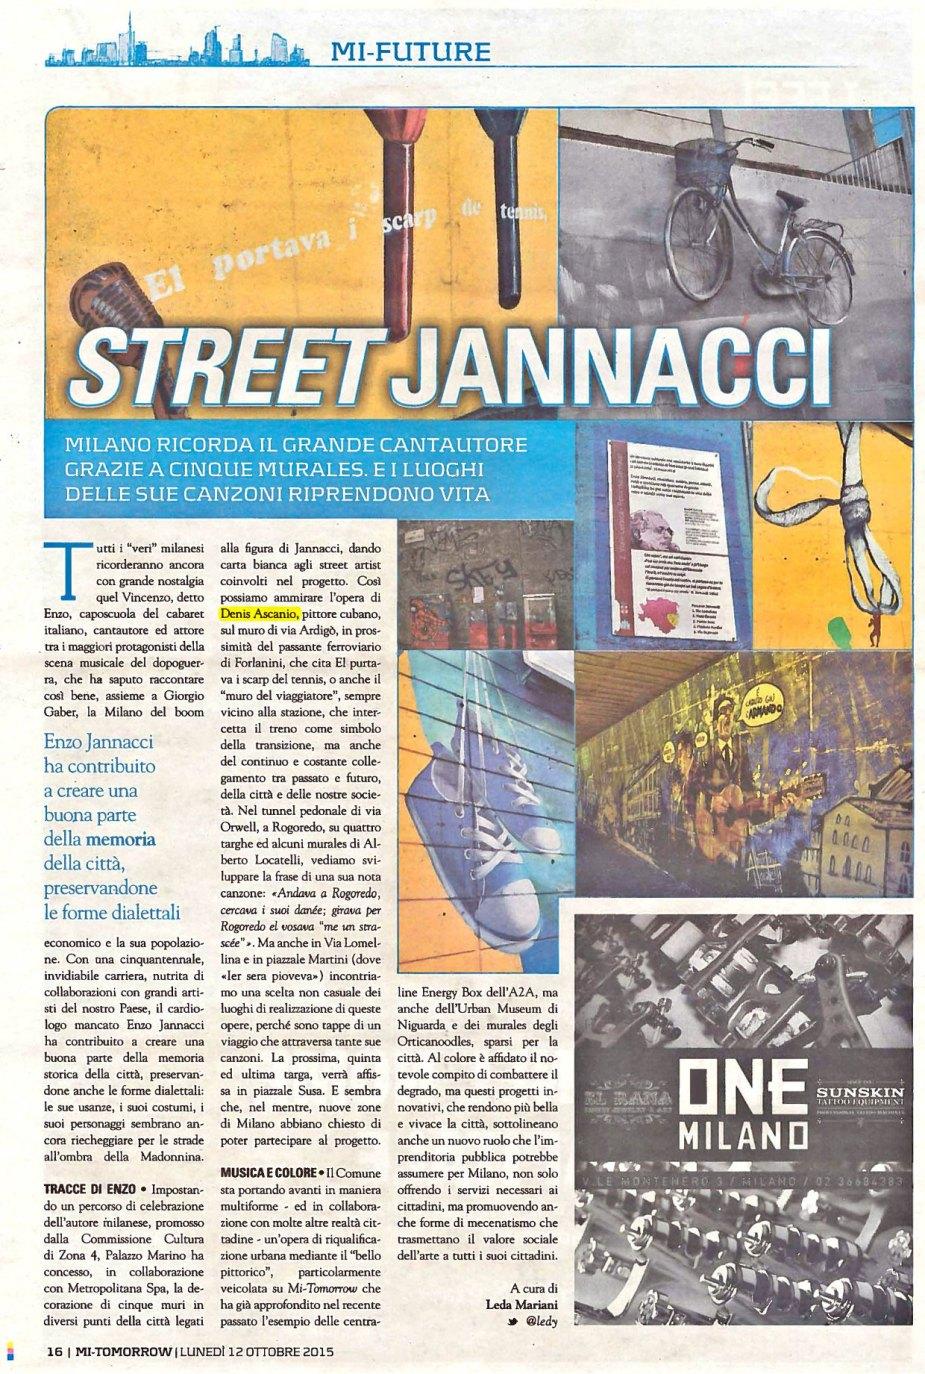 STREET JANNACCI - News - (Ascanio Cuba)